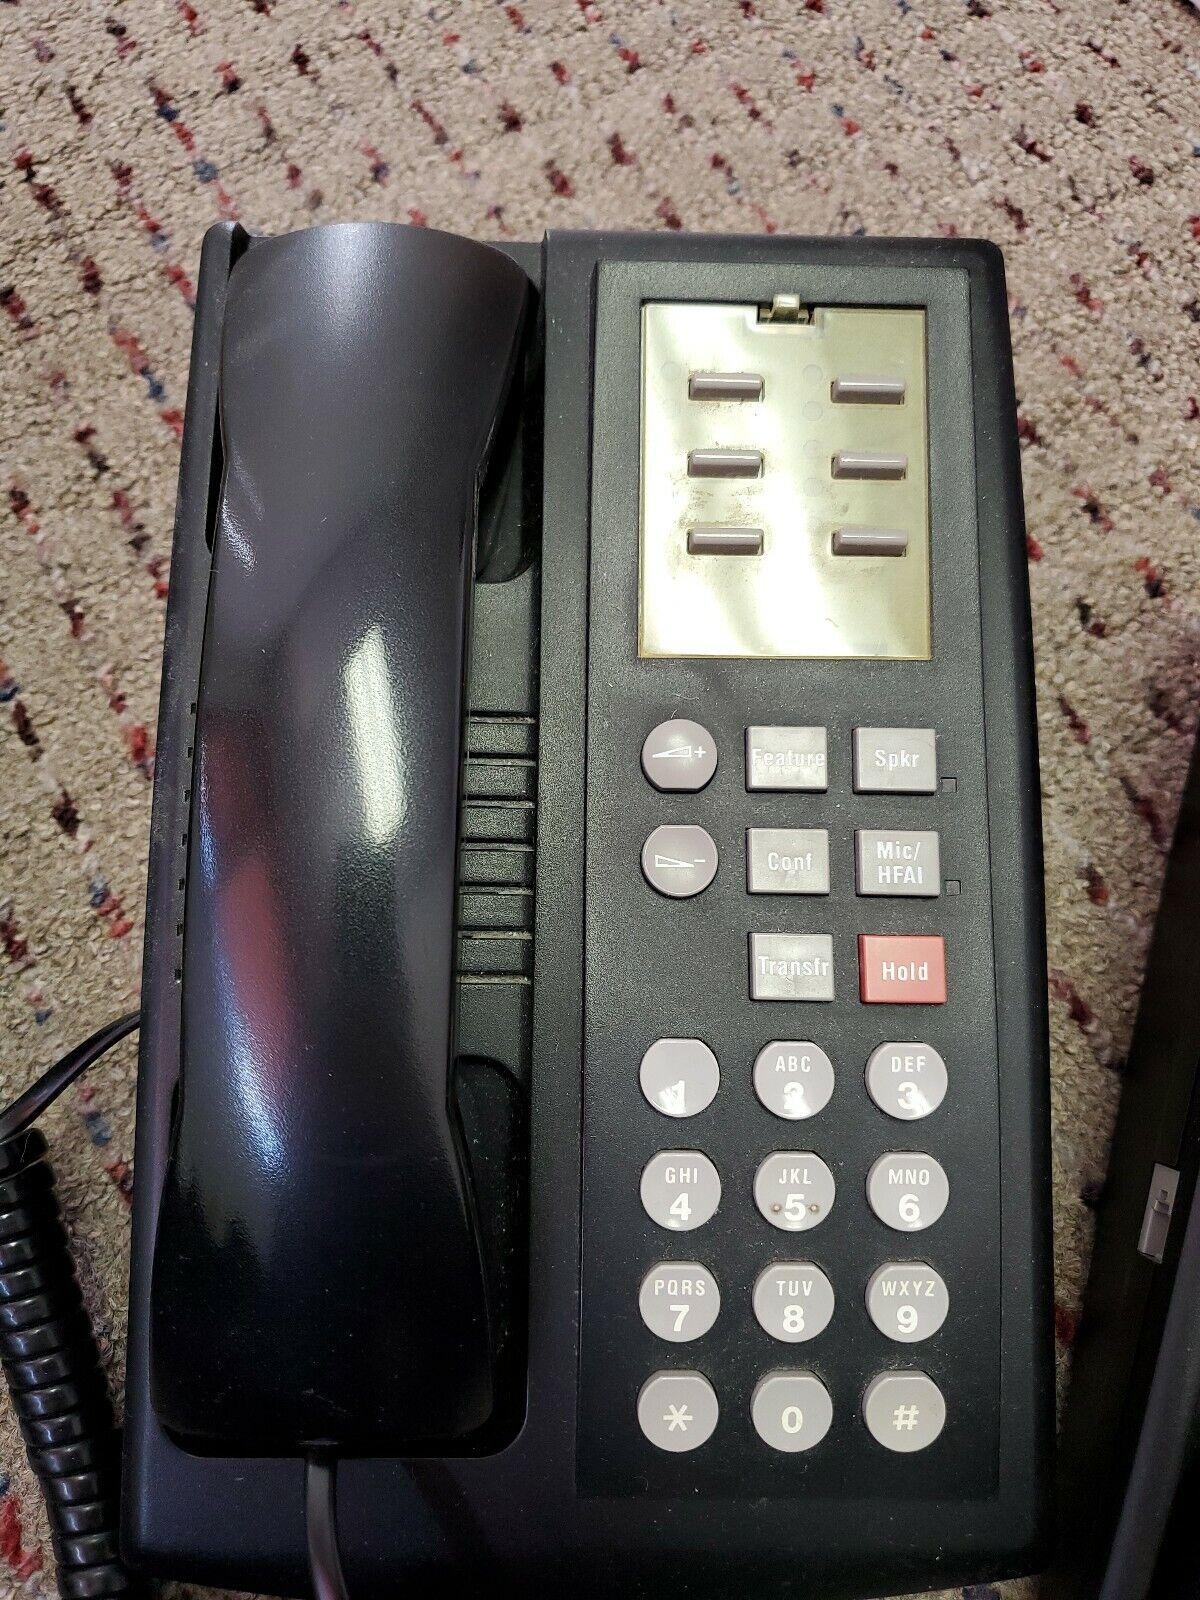 108236712 Avaya Partner MLS-18D 2-Line Display Phone Office ...